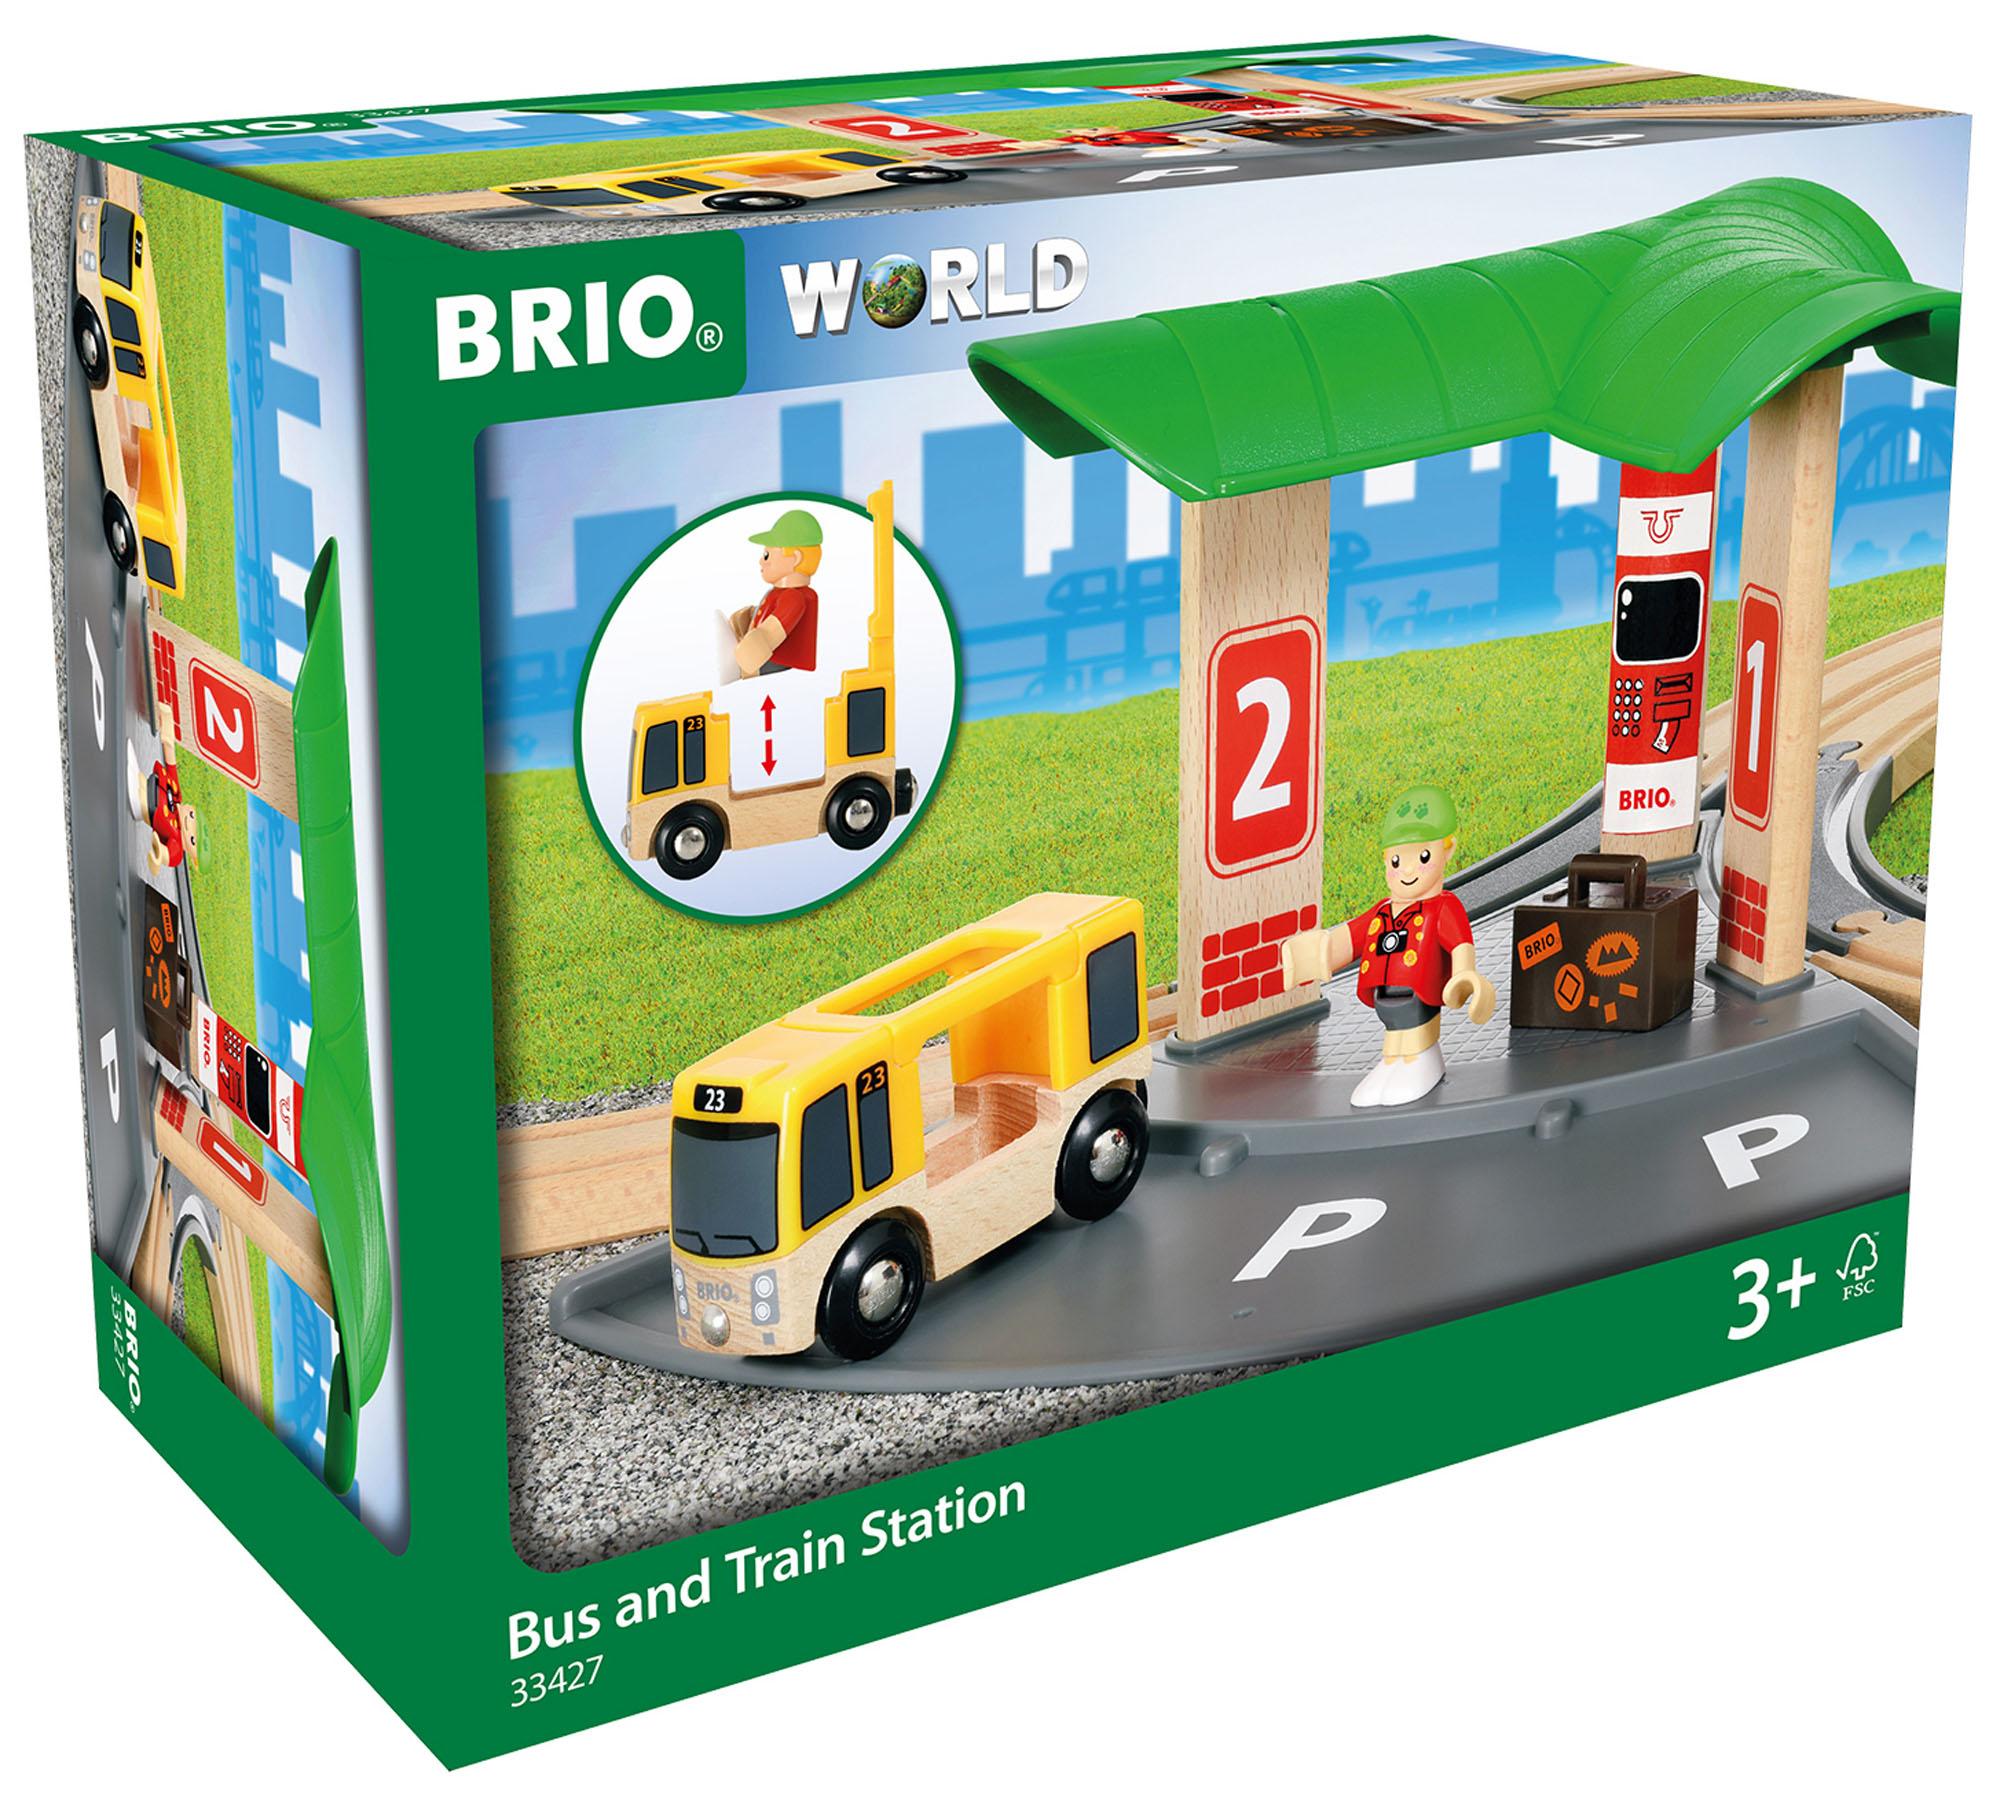 Brio Railway Set Full Range Of Wooden Train Sets Children